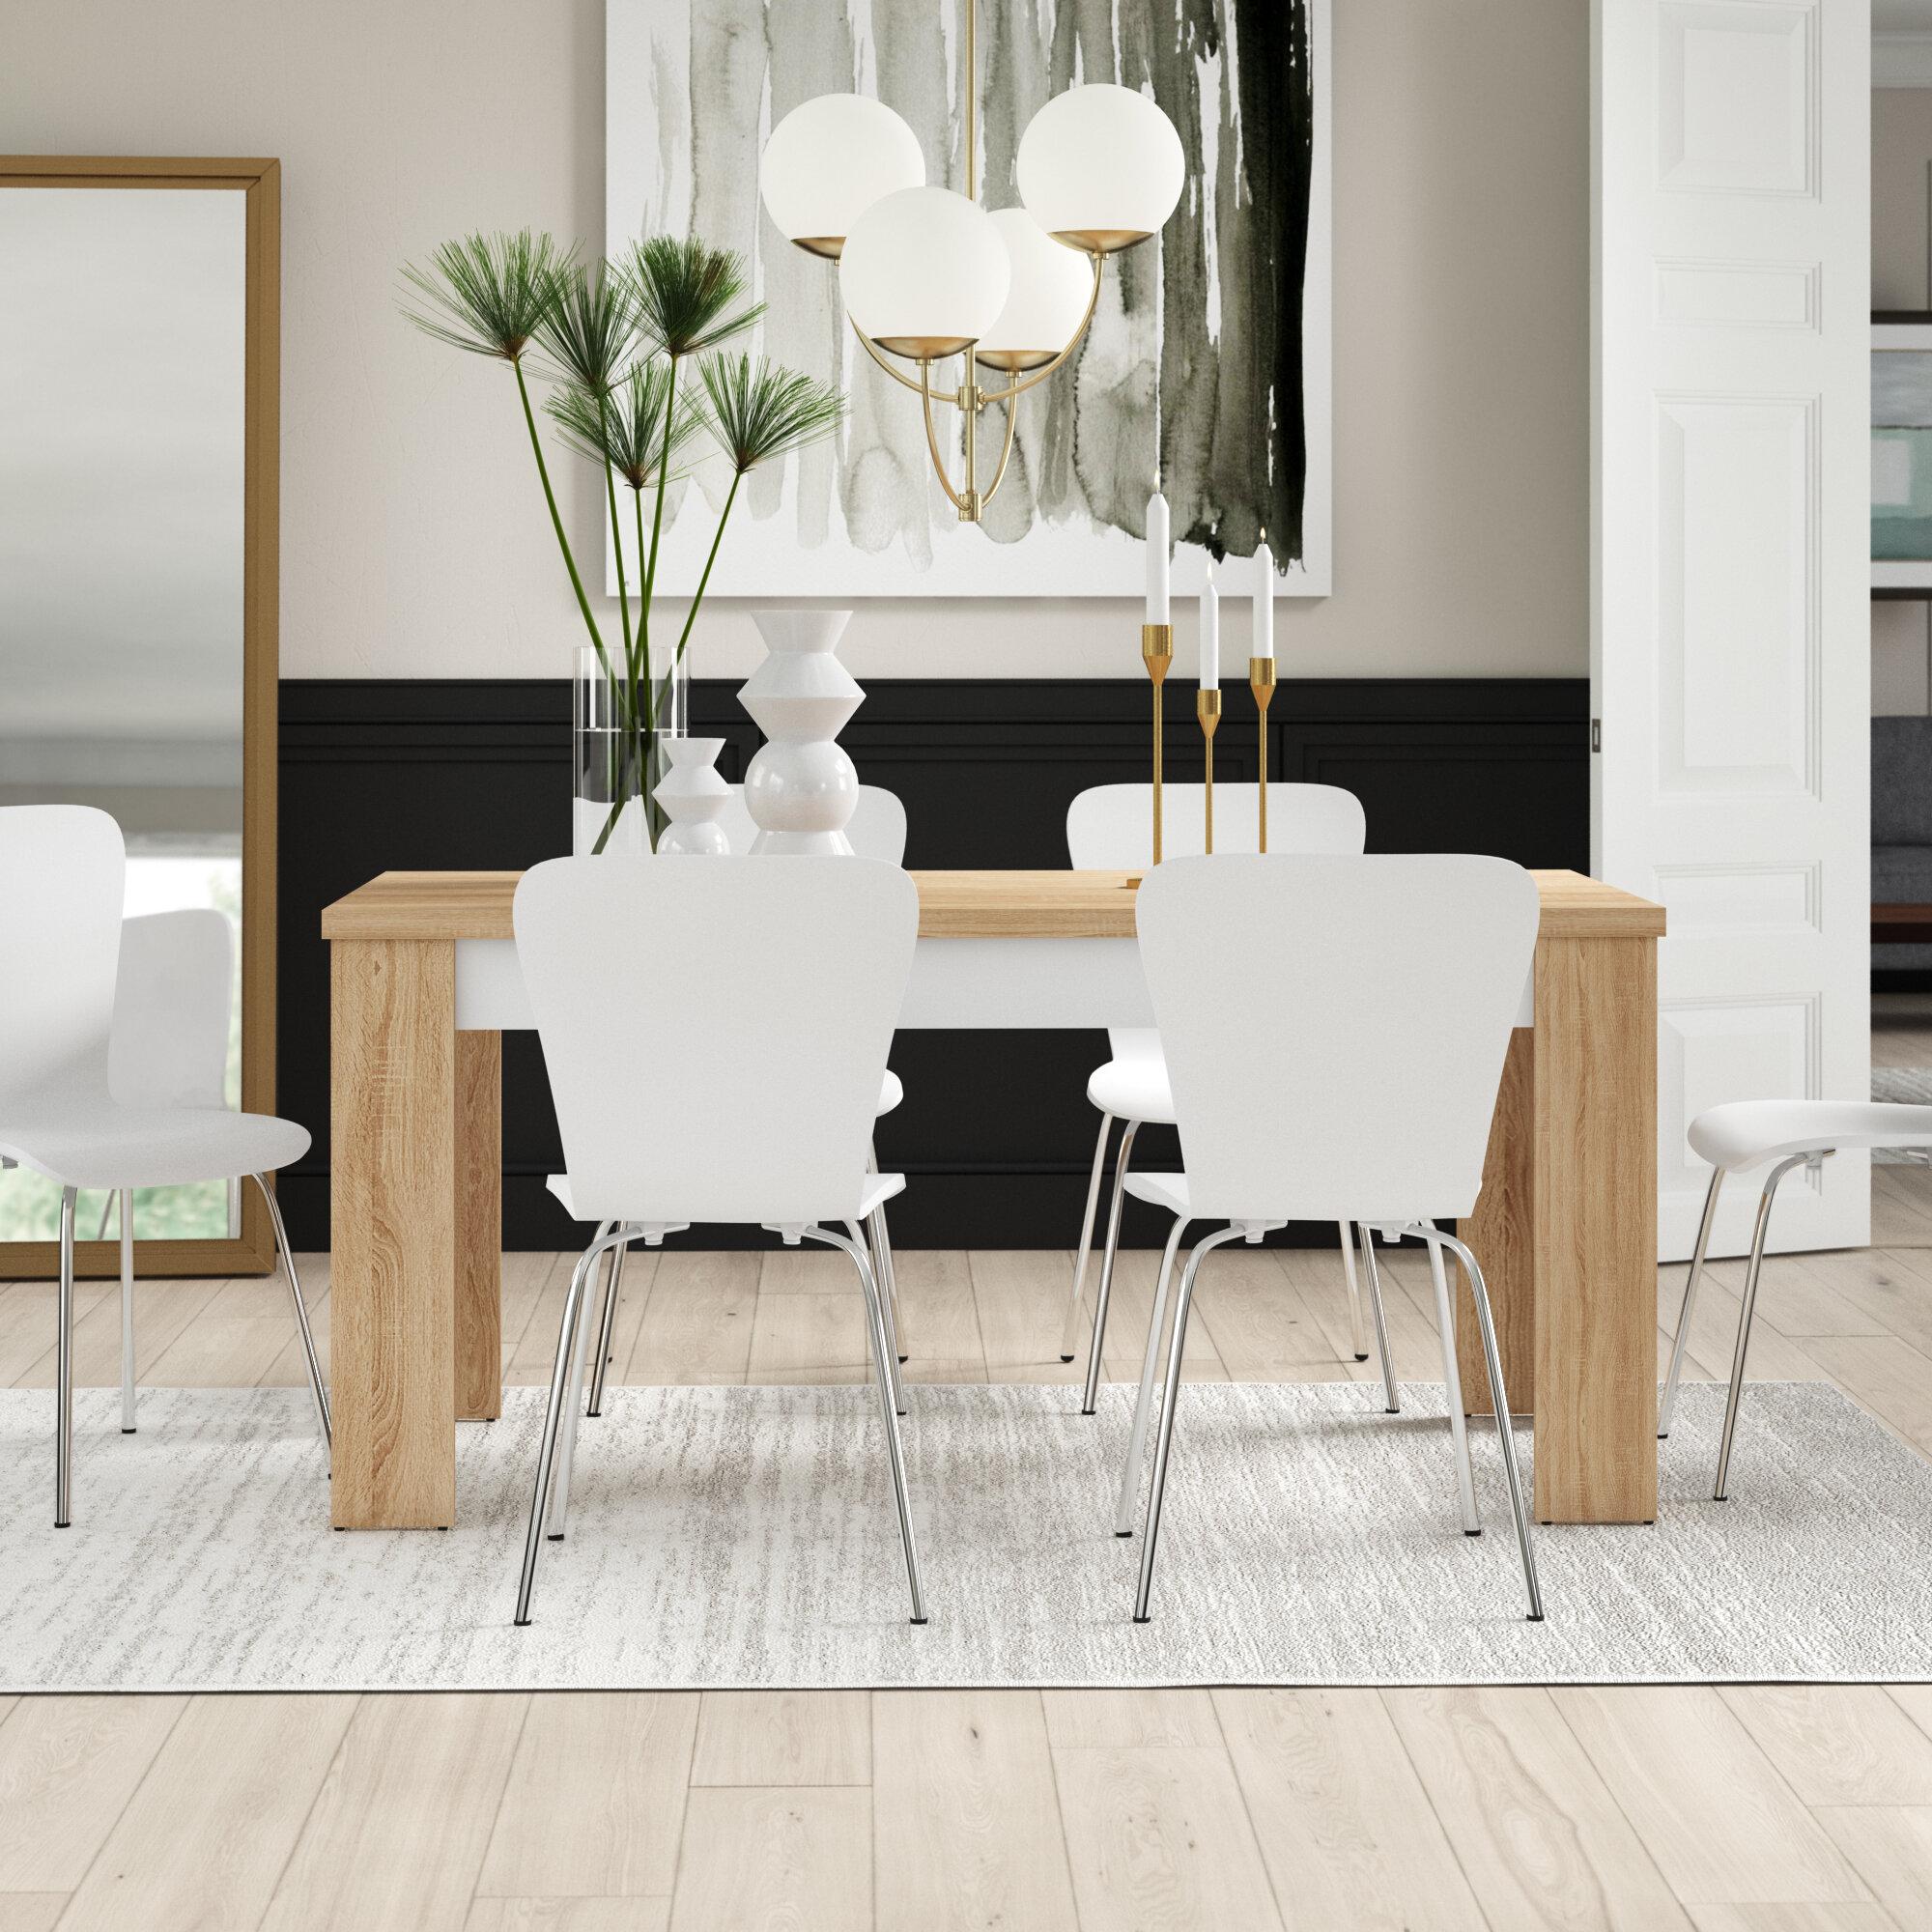 Superieur Algedi 7 Piece Dining Set